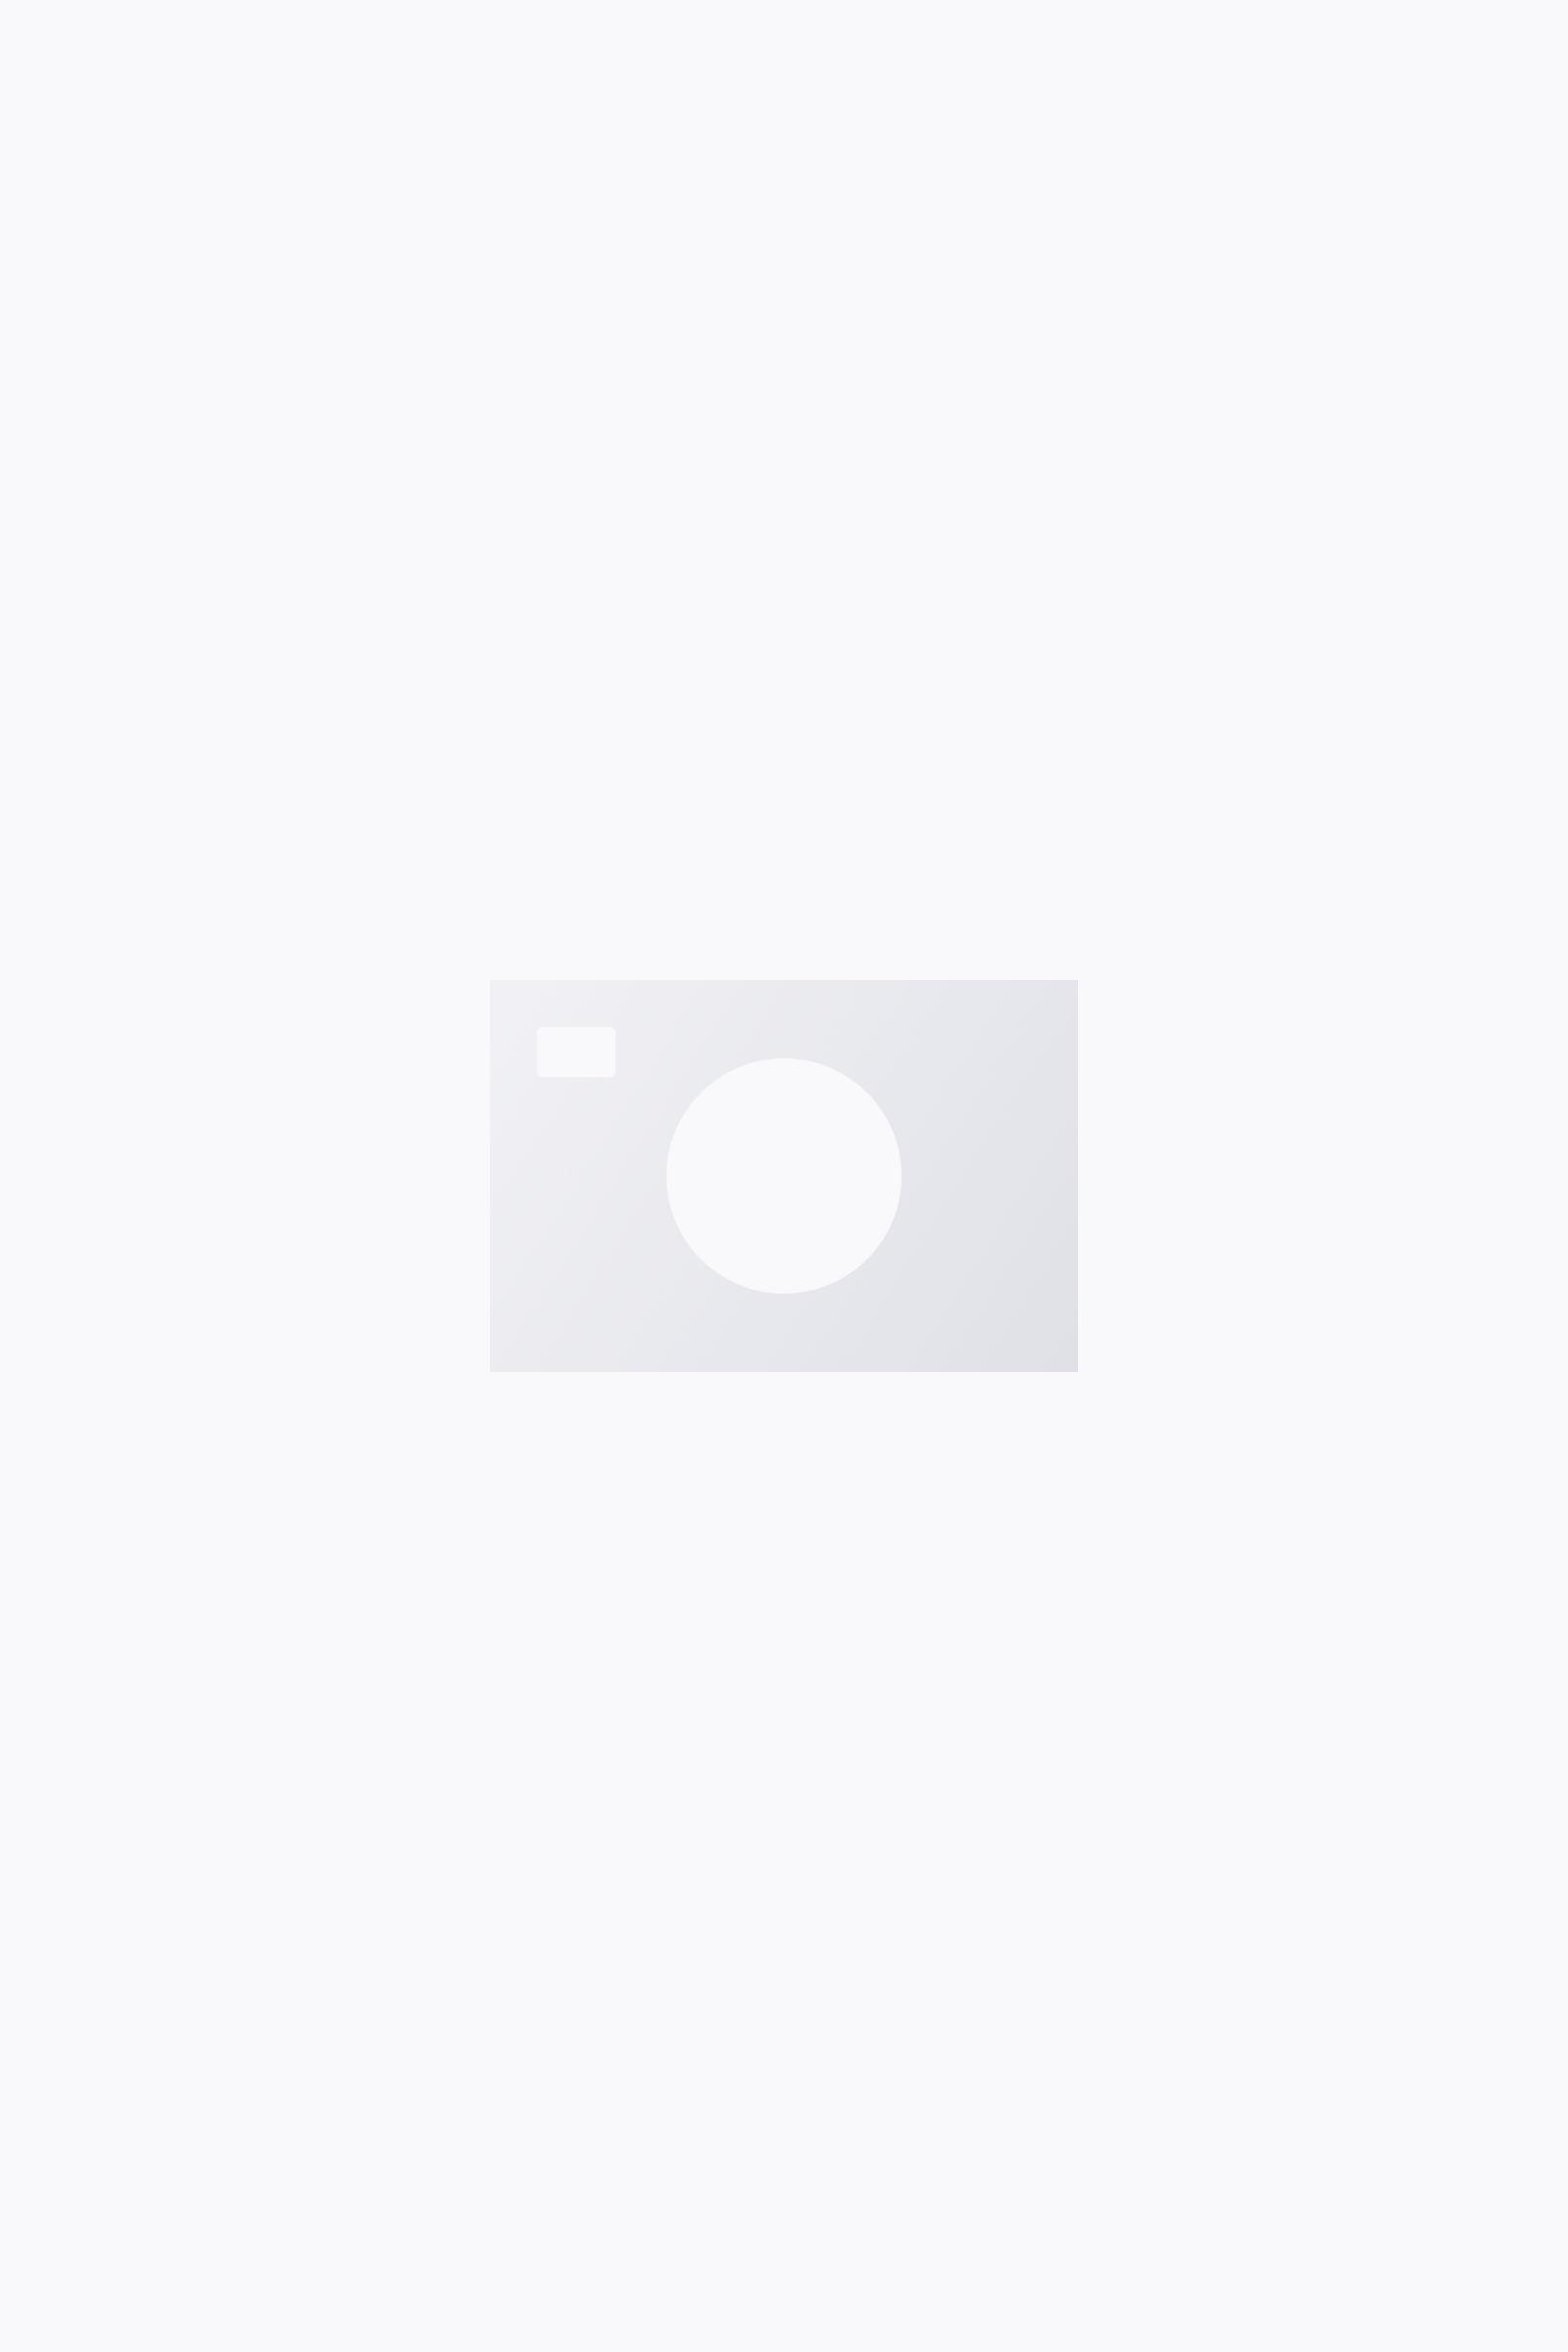 ORGANIC COTTON KIMONO STYLE CARDIGAN - Off-white - Cardigans - COS US